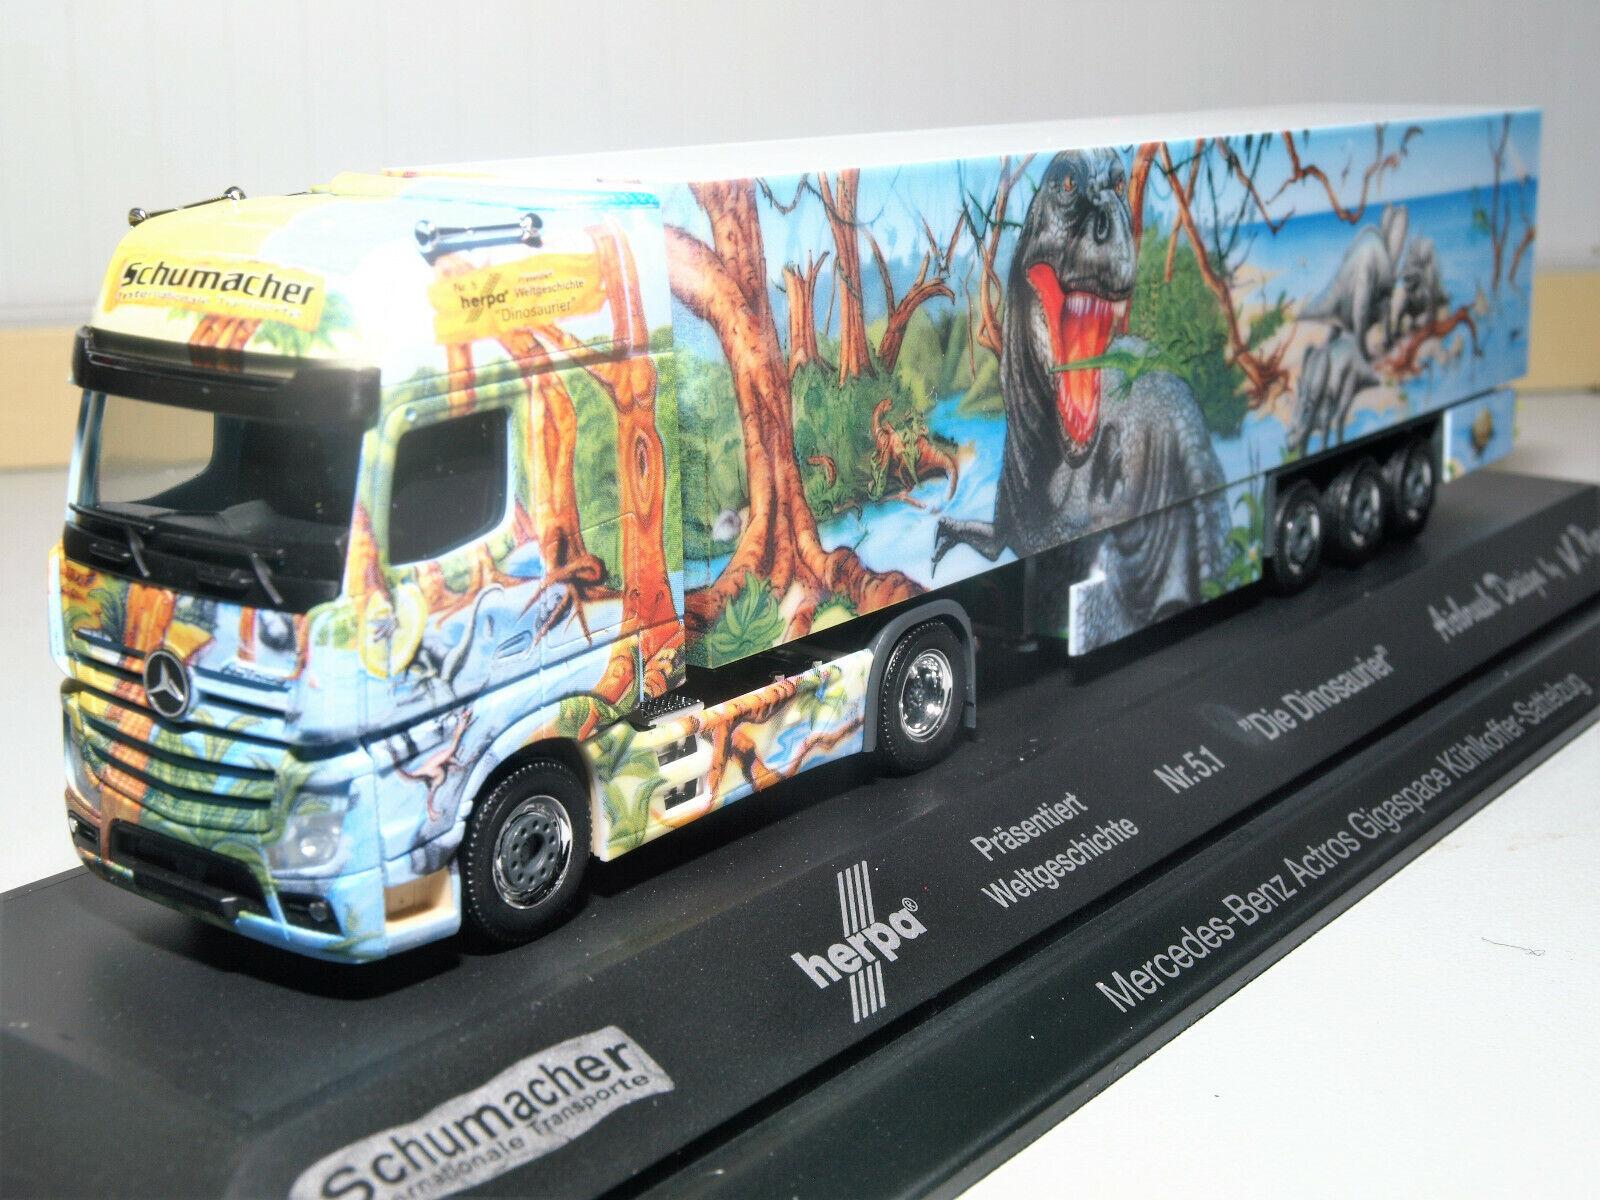 MB actros gigaspace refrigeración maleta SZ Herpa historia mundial nº 5.1 dinosaurios 121934